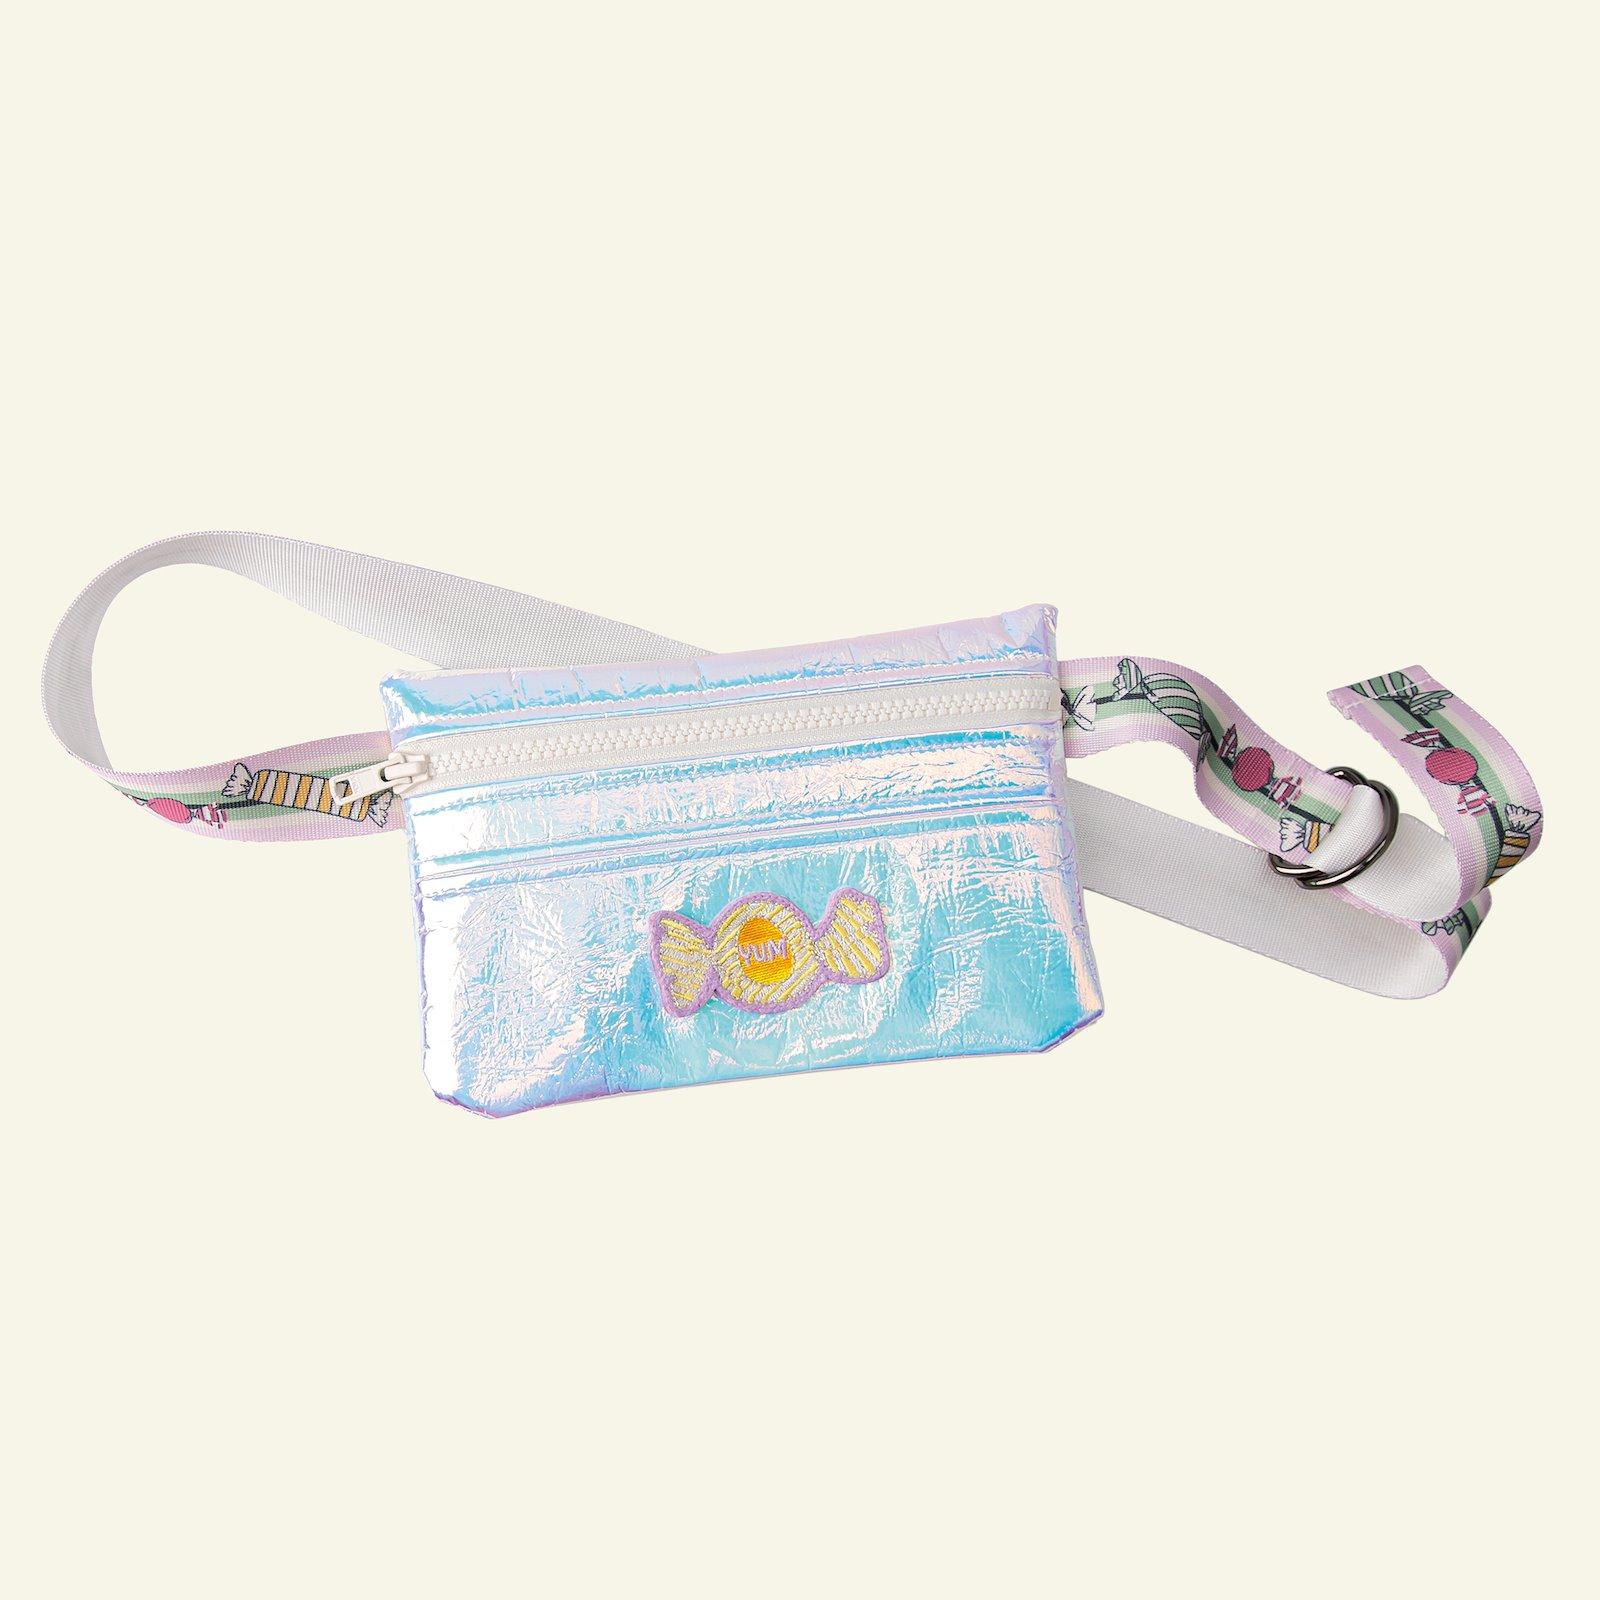 Patch candy 36x70mm yell/purpl 1pc p90328_824045_82409_26523_sskit